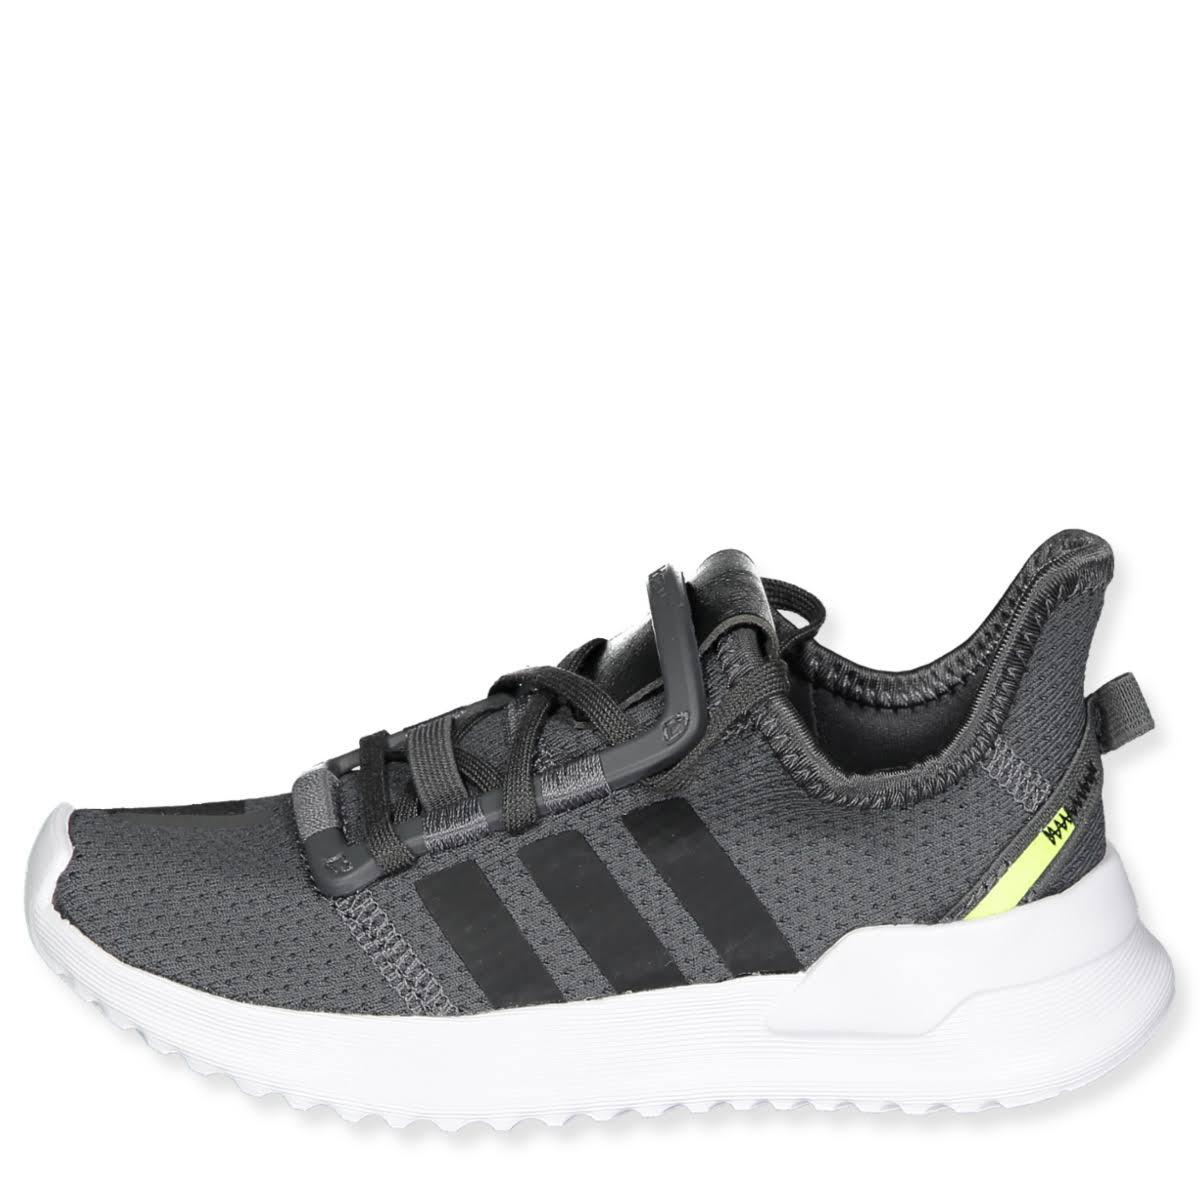 Adidas Originals Children Boys U_Path Run Trainers Size 10 in Grey